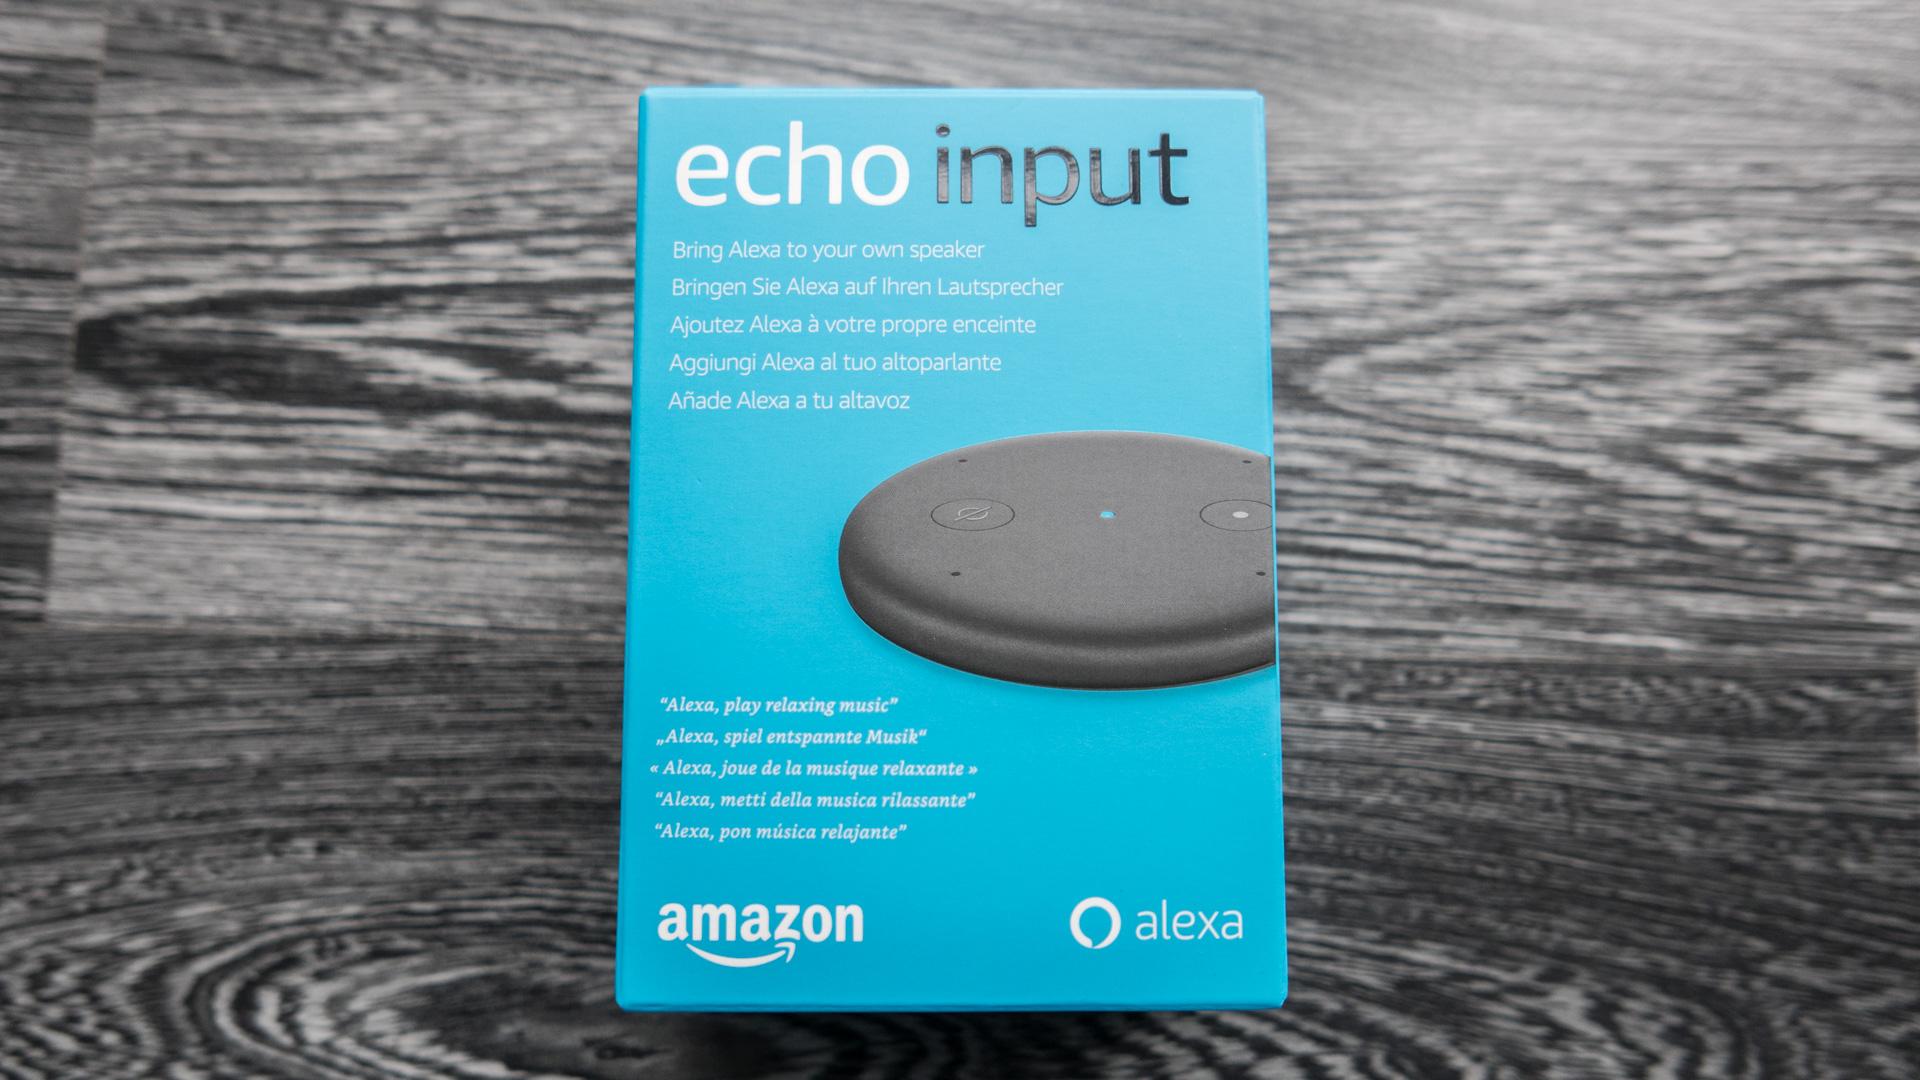 Amazon-Echo-Input-Details-1